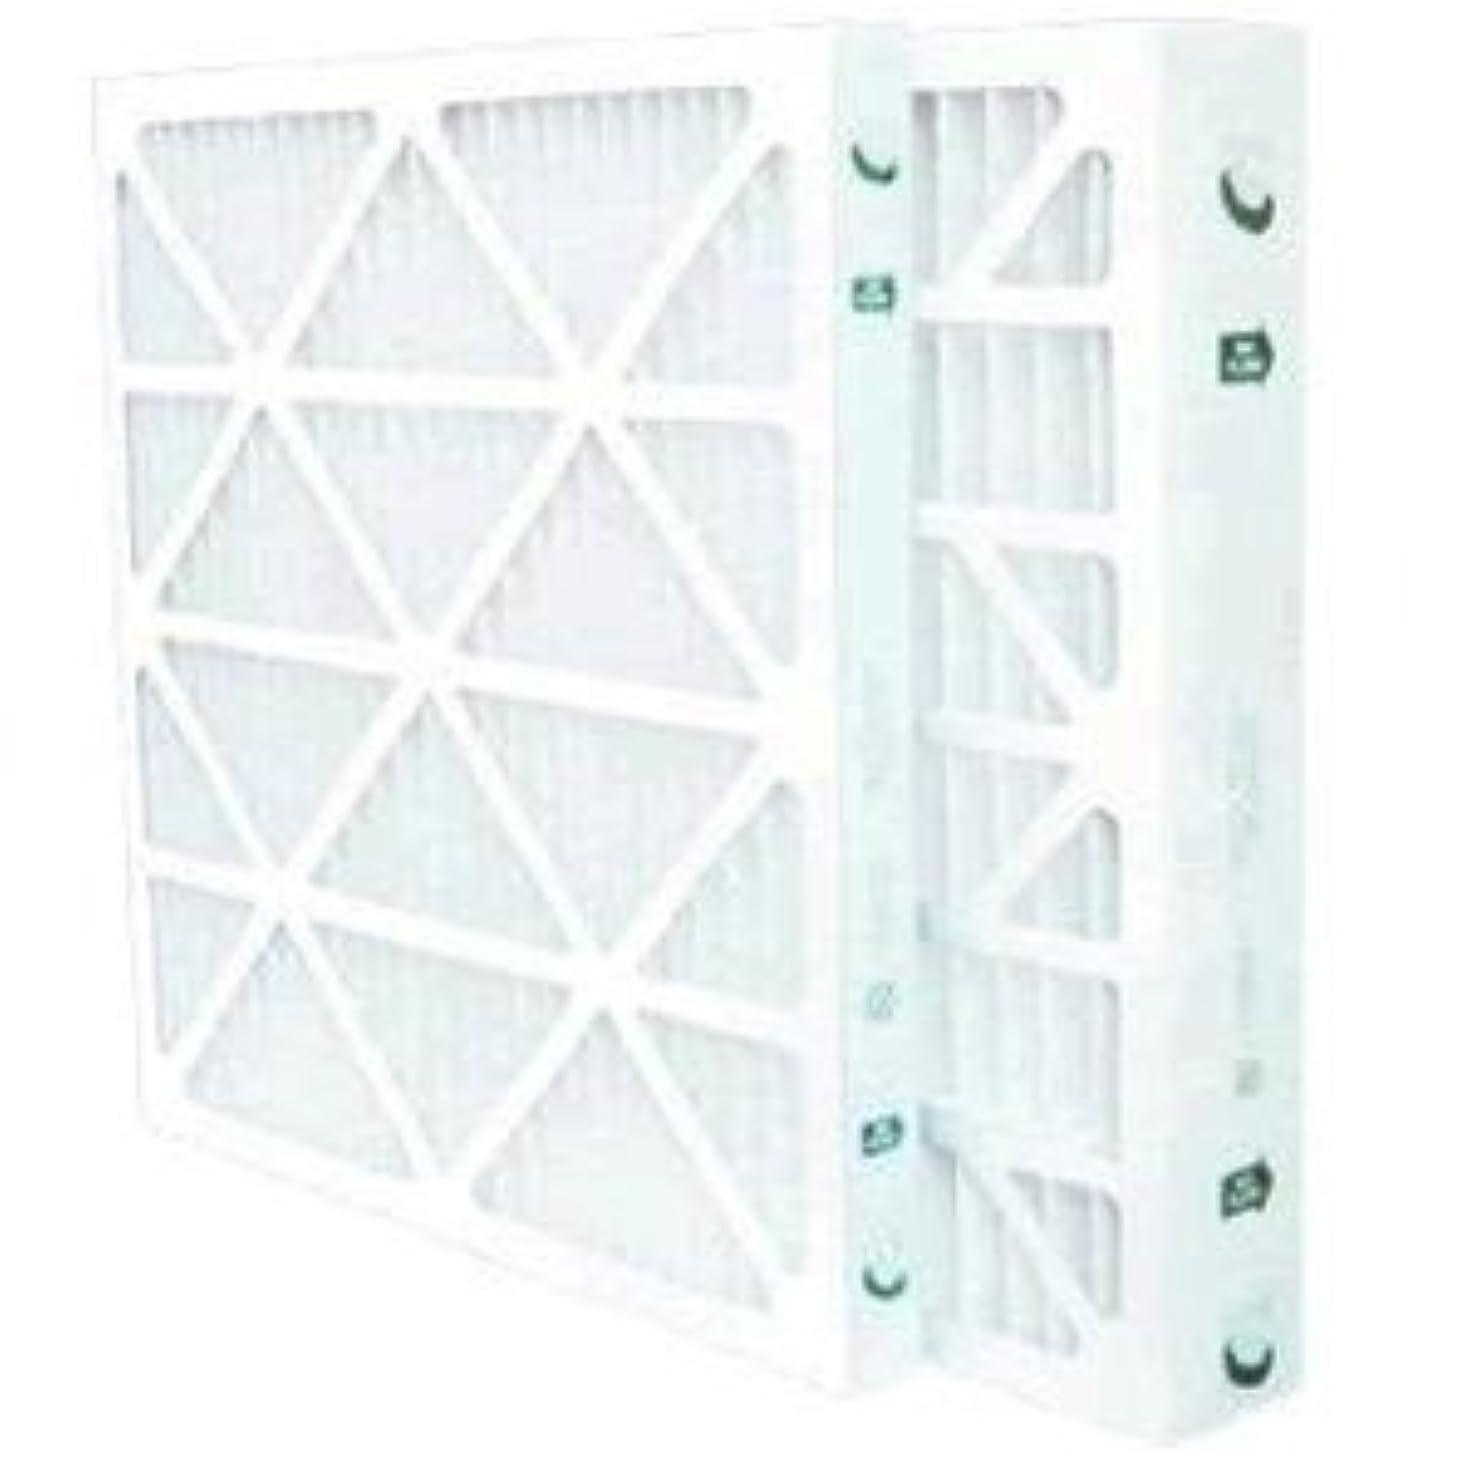 20 x 25 x 1 Merv 8 Furnace Filter (12 Pack)